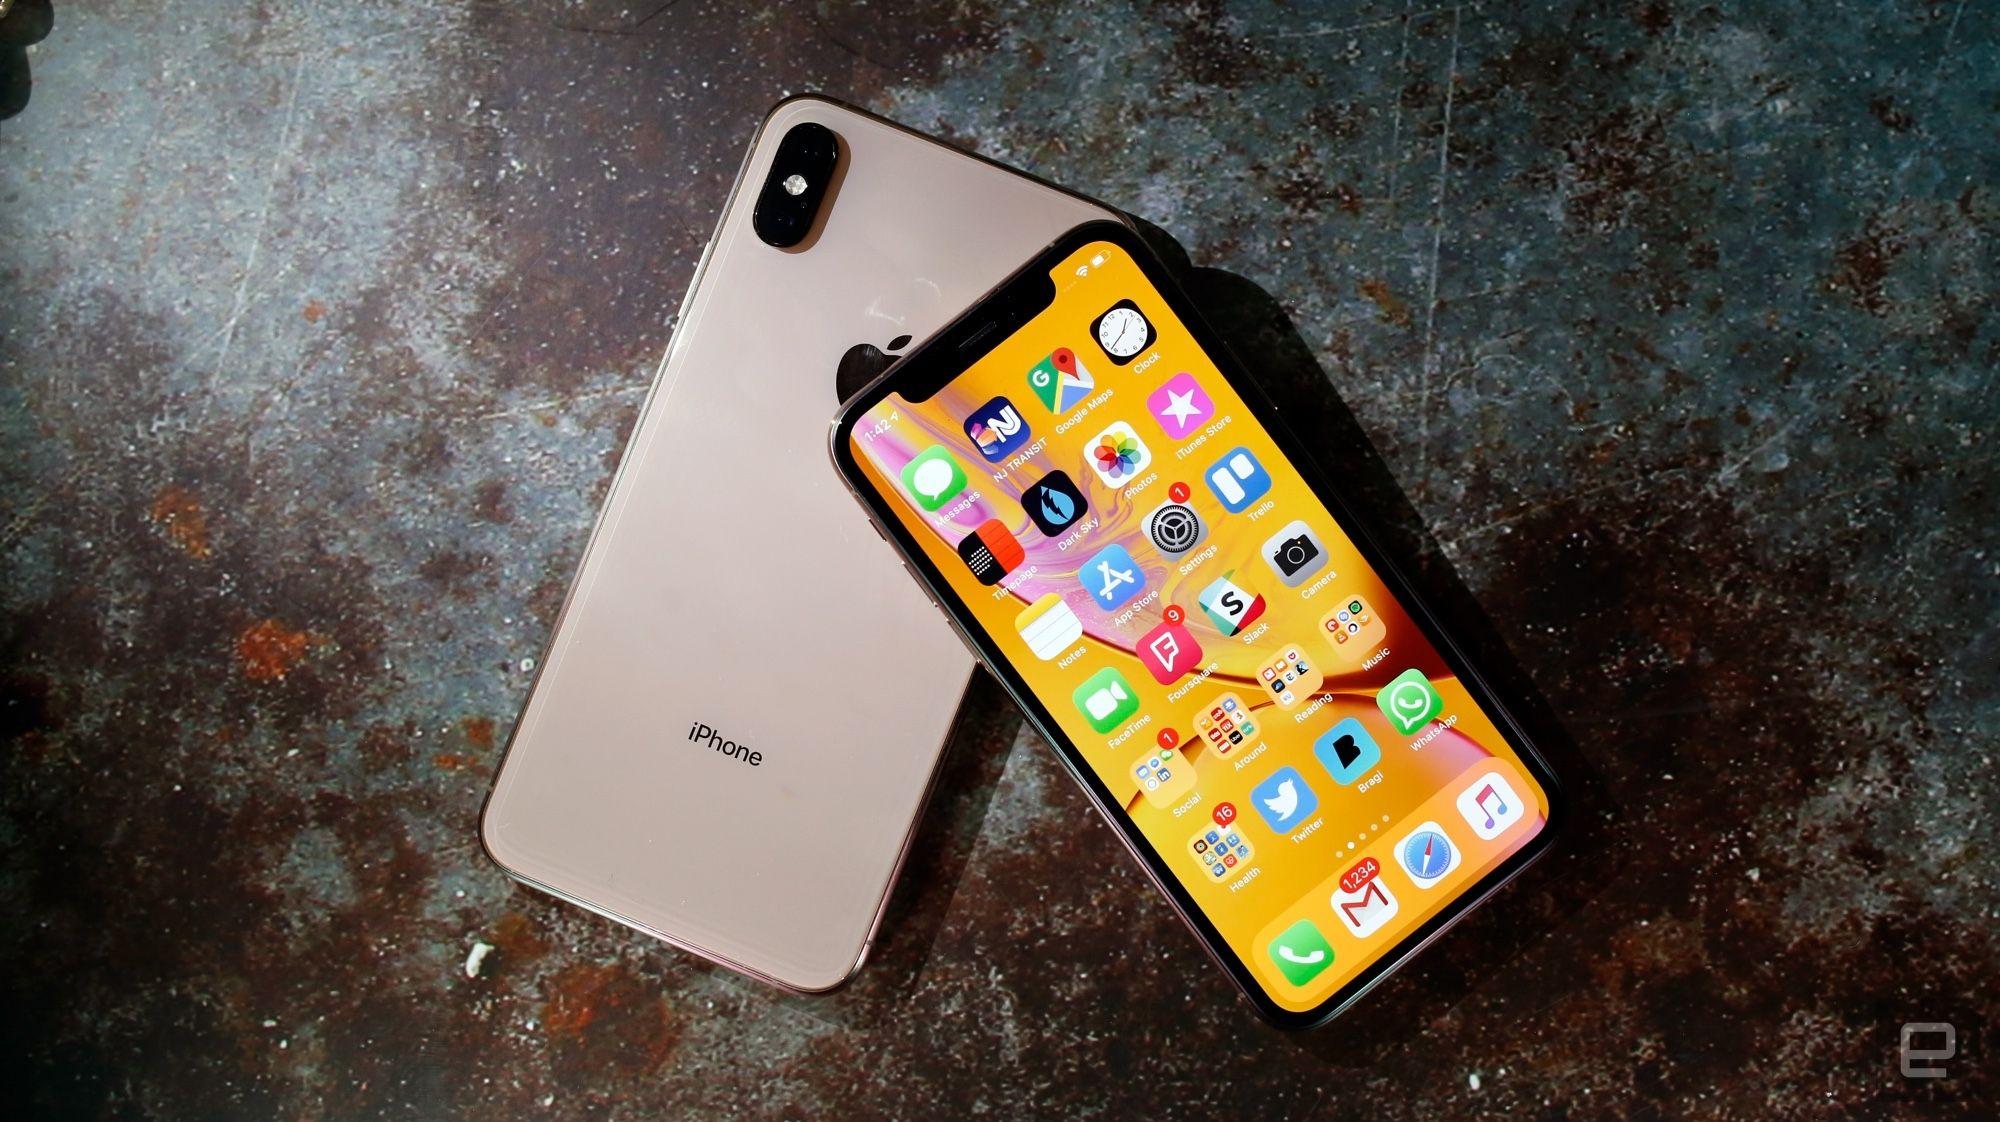 Best replicaclonefake iphone xs max with wireless